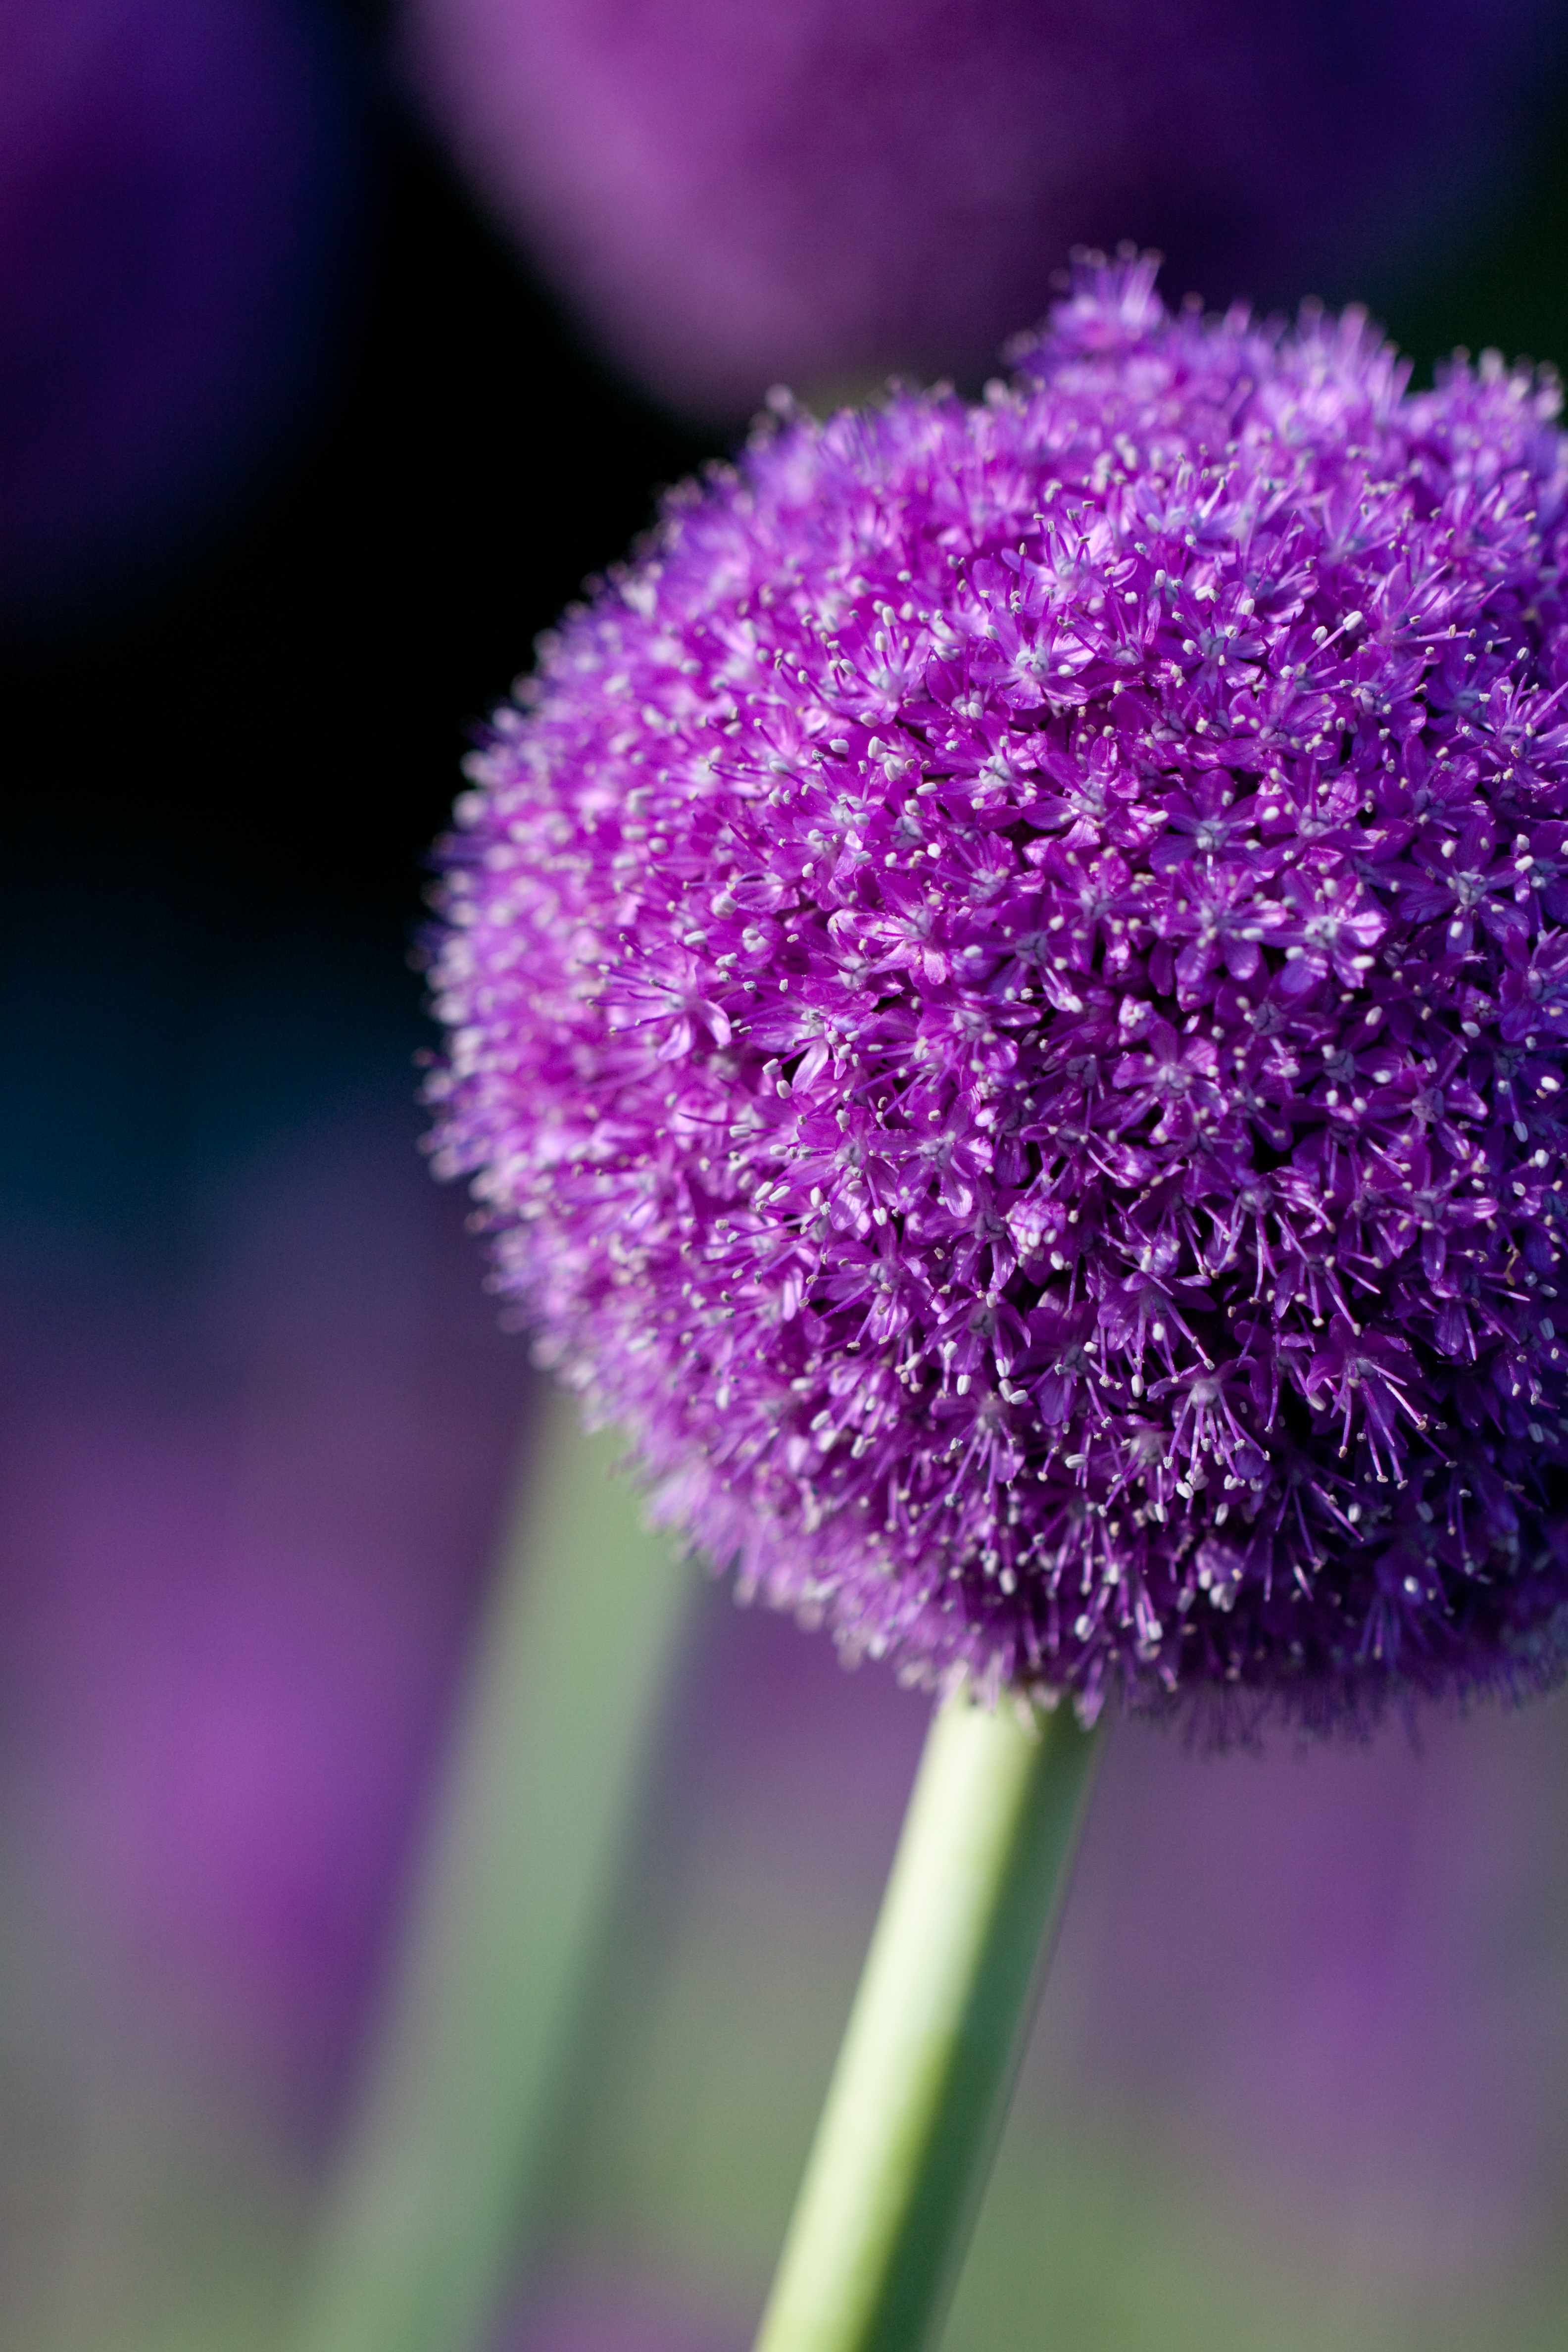 File Flower Allium giganteum Flickr nekonomania 1 Wikimedia mons